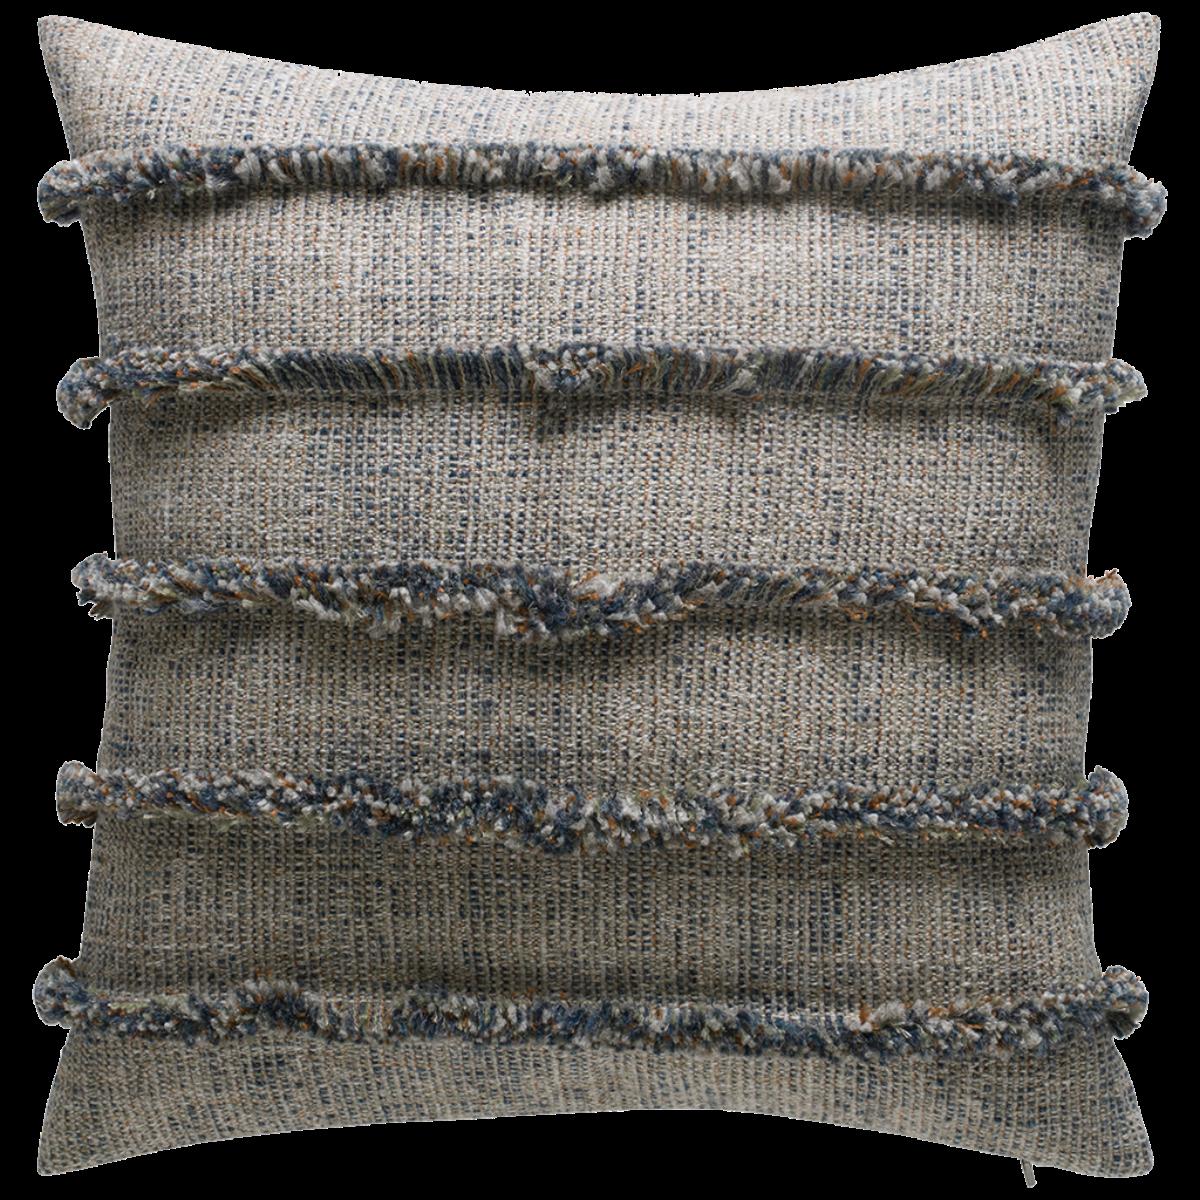 de Le Cuona | Rogue Cushion With Fringe Detail Creek